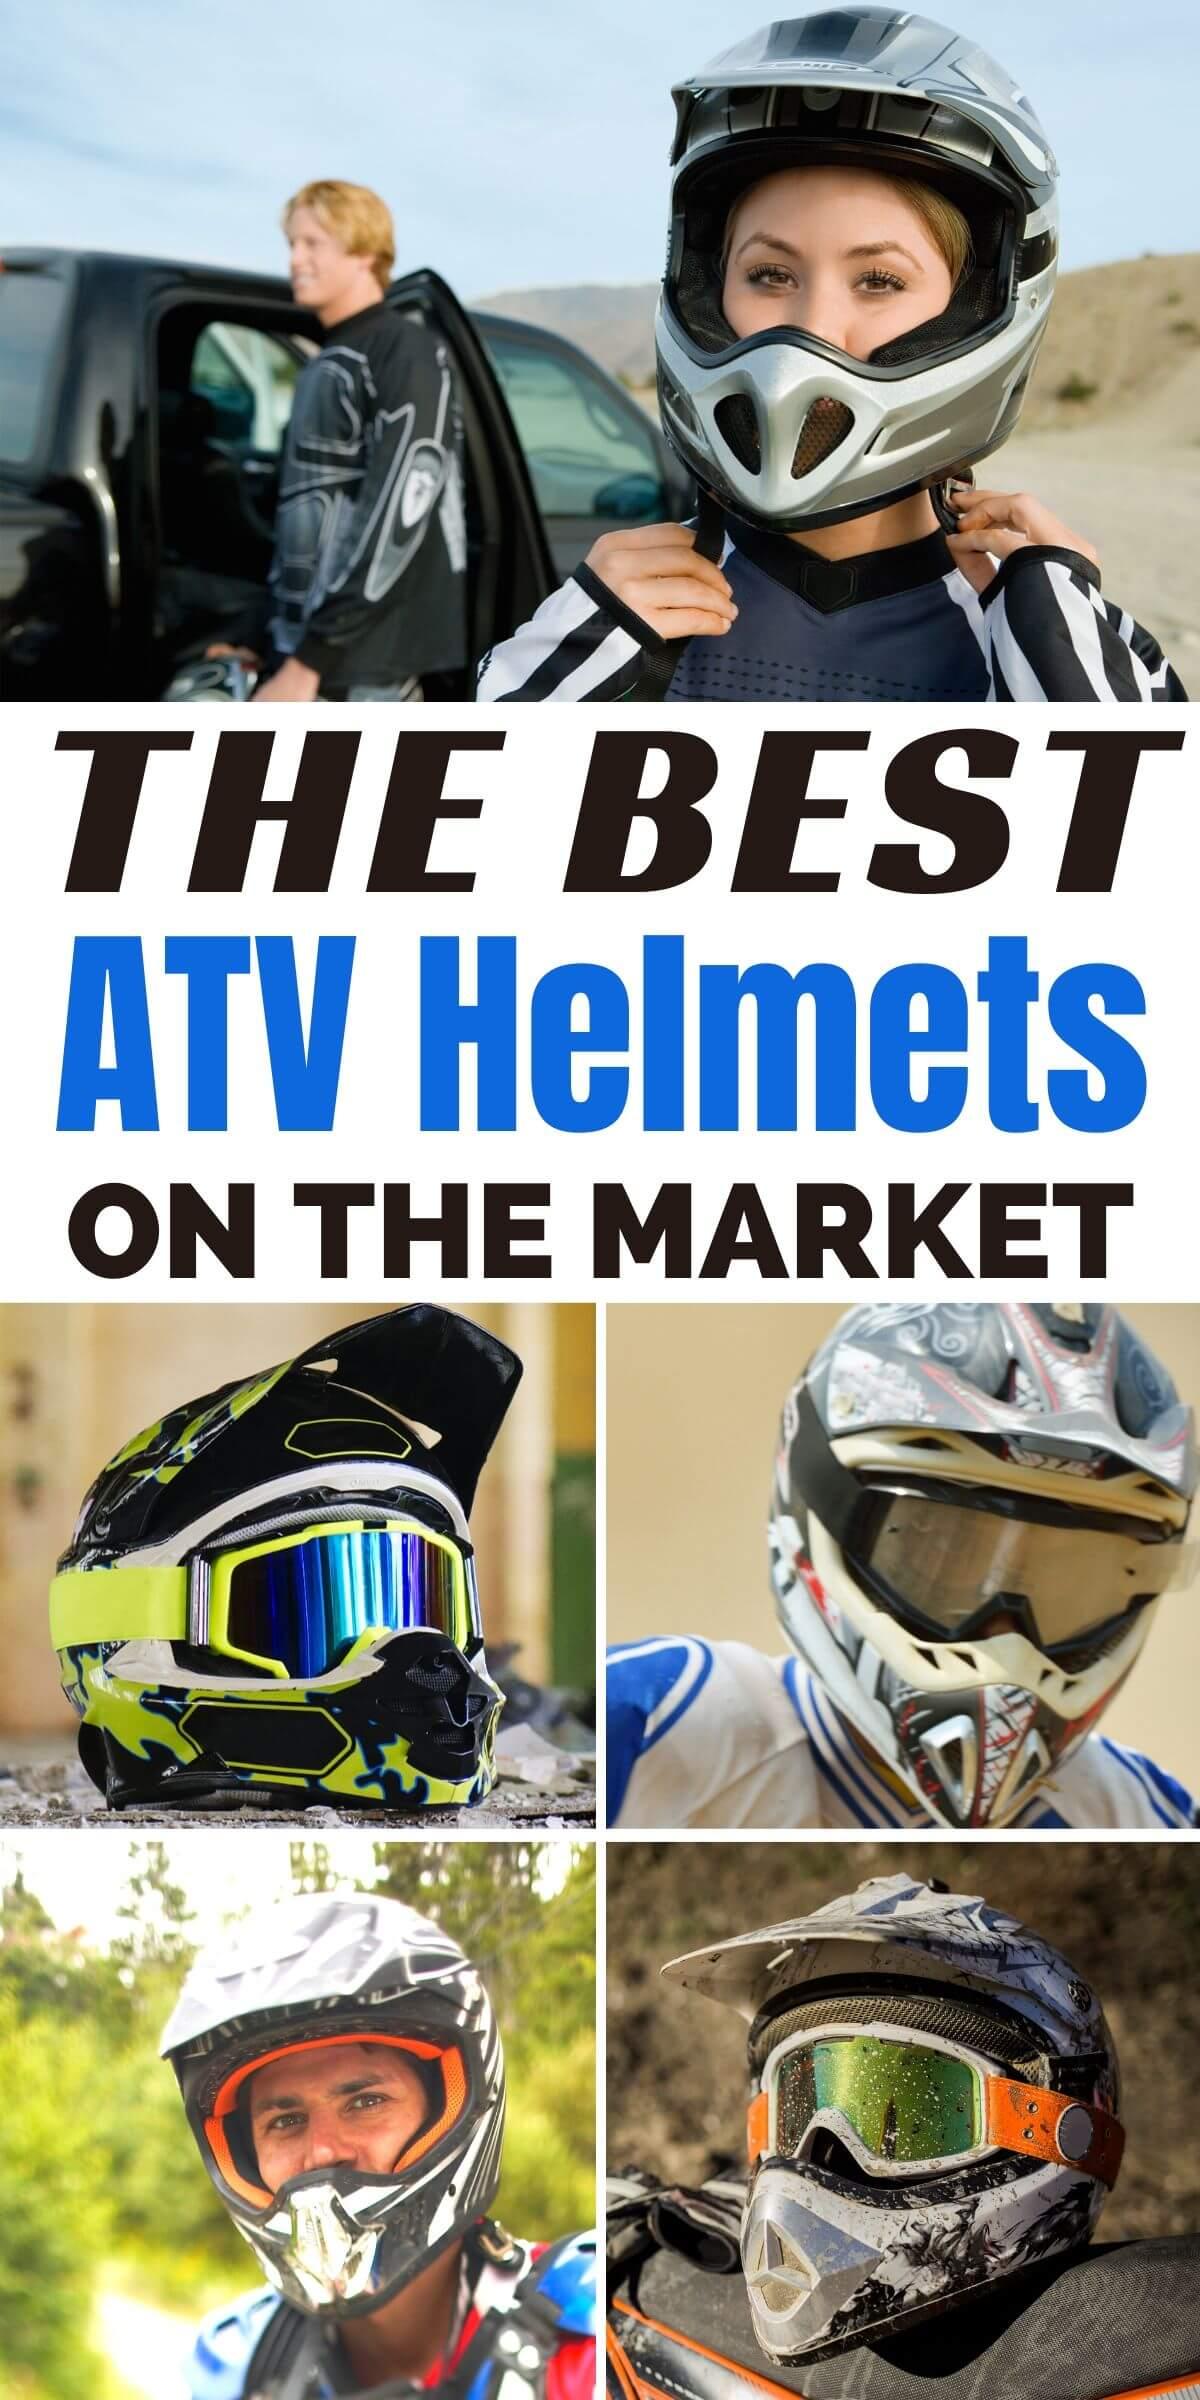 Best ATV Helmets on the Market